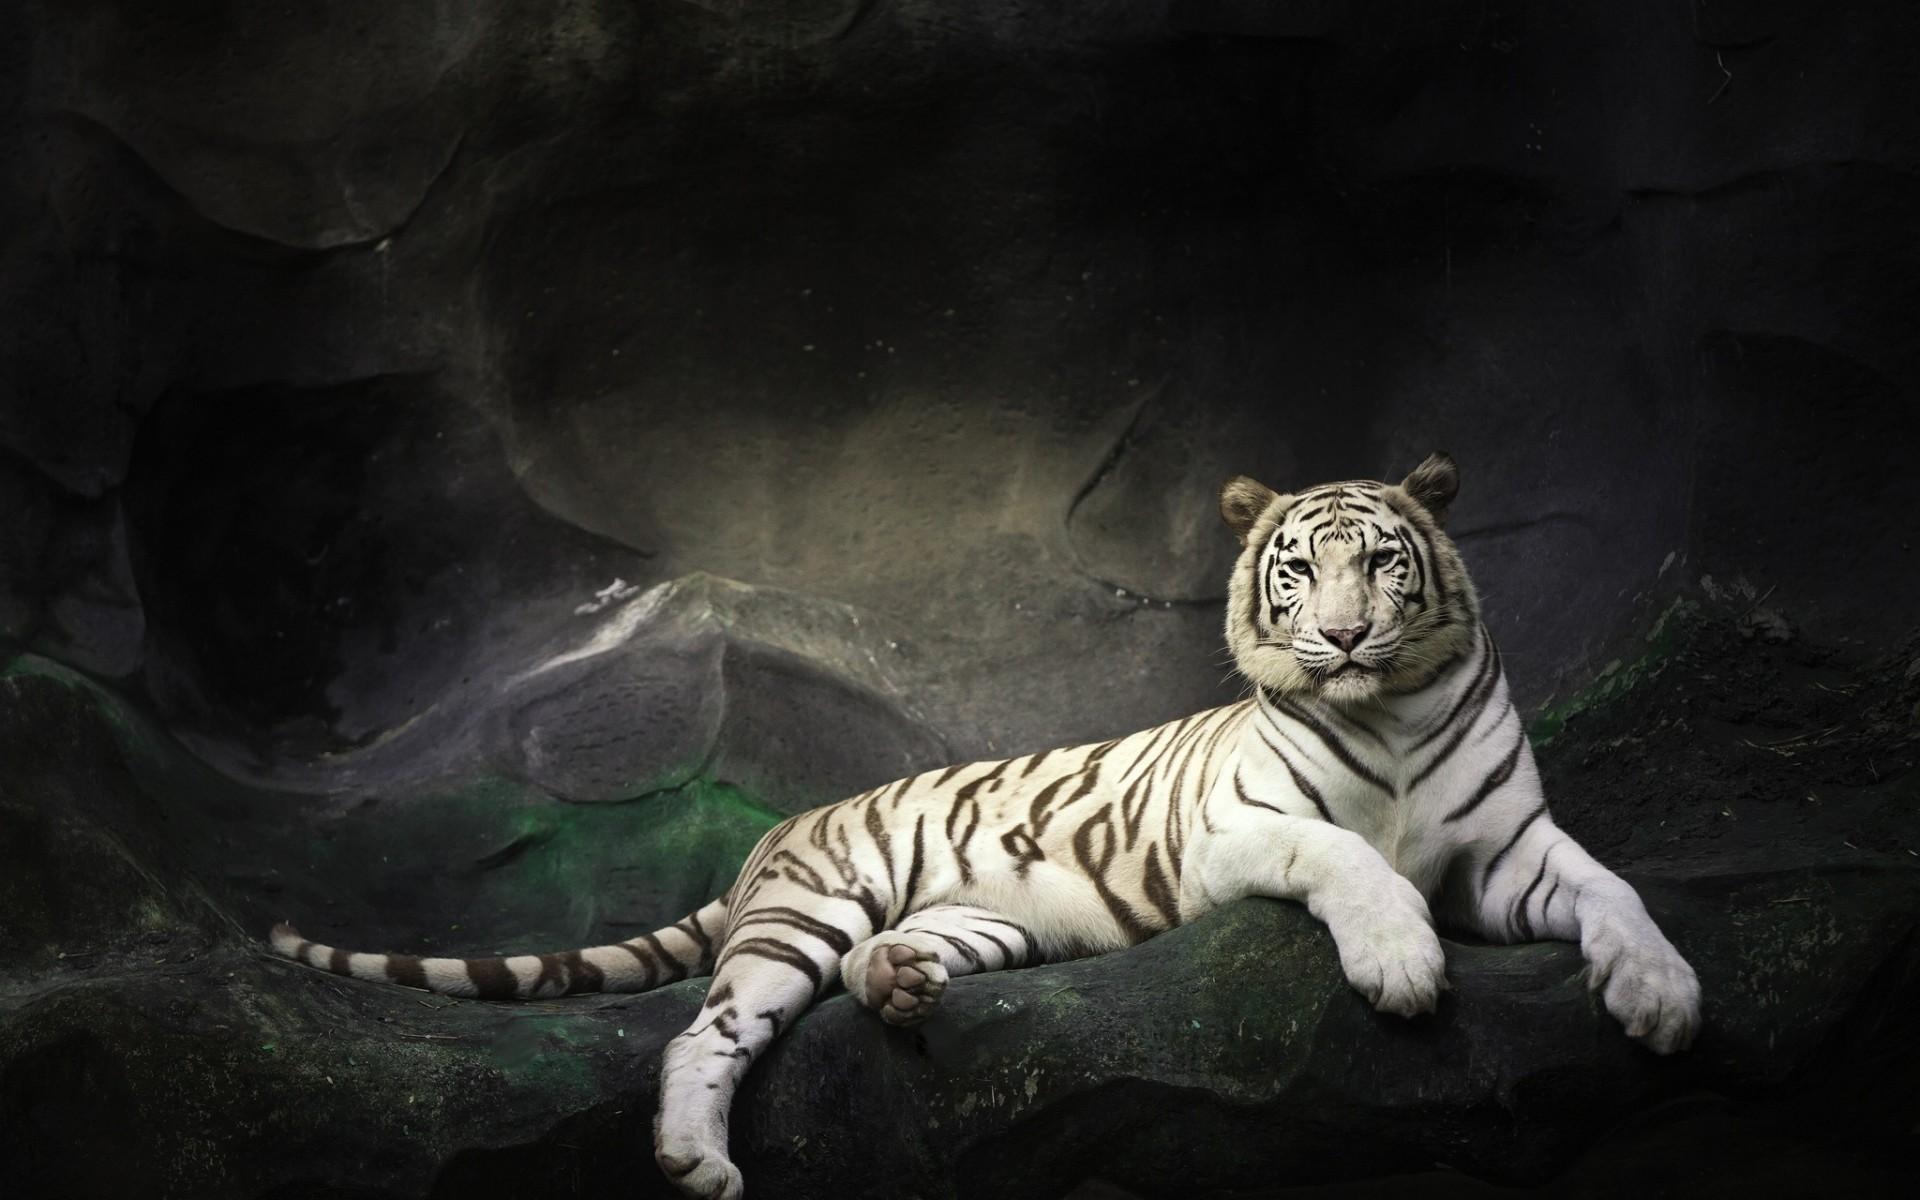 wallpaper white tiger desktop hd snake wallpaper dangerous hd eastern 1920x1200